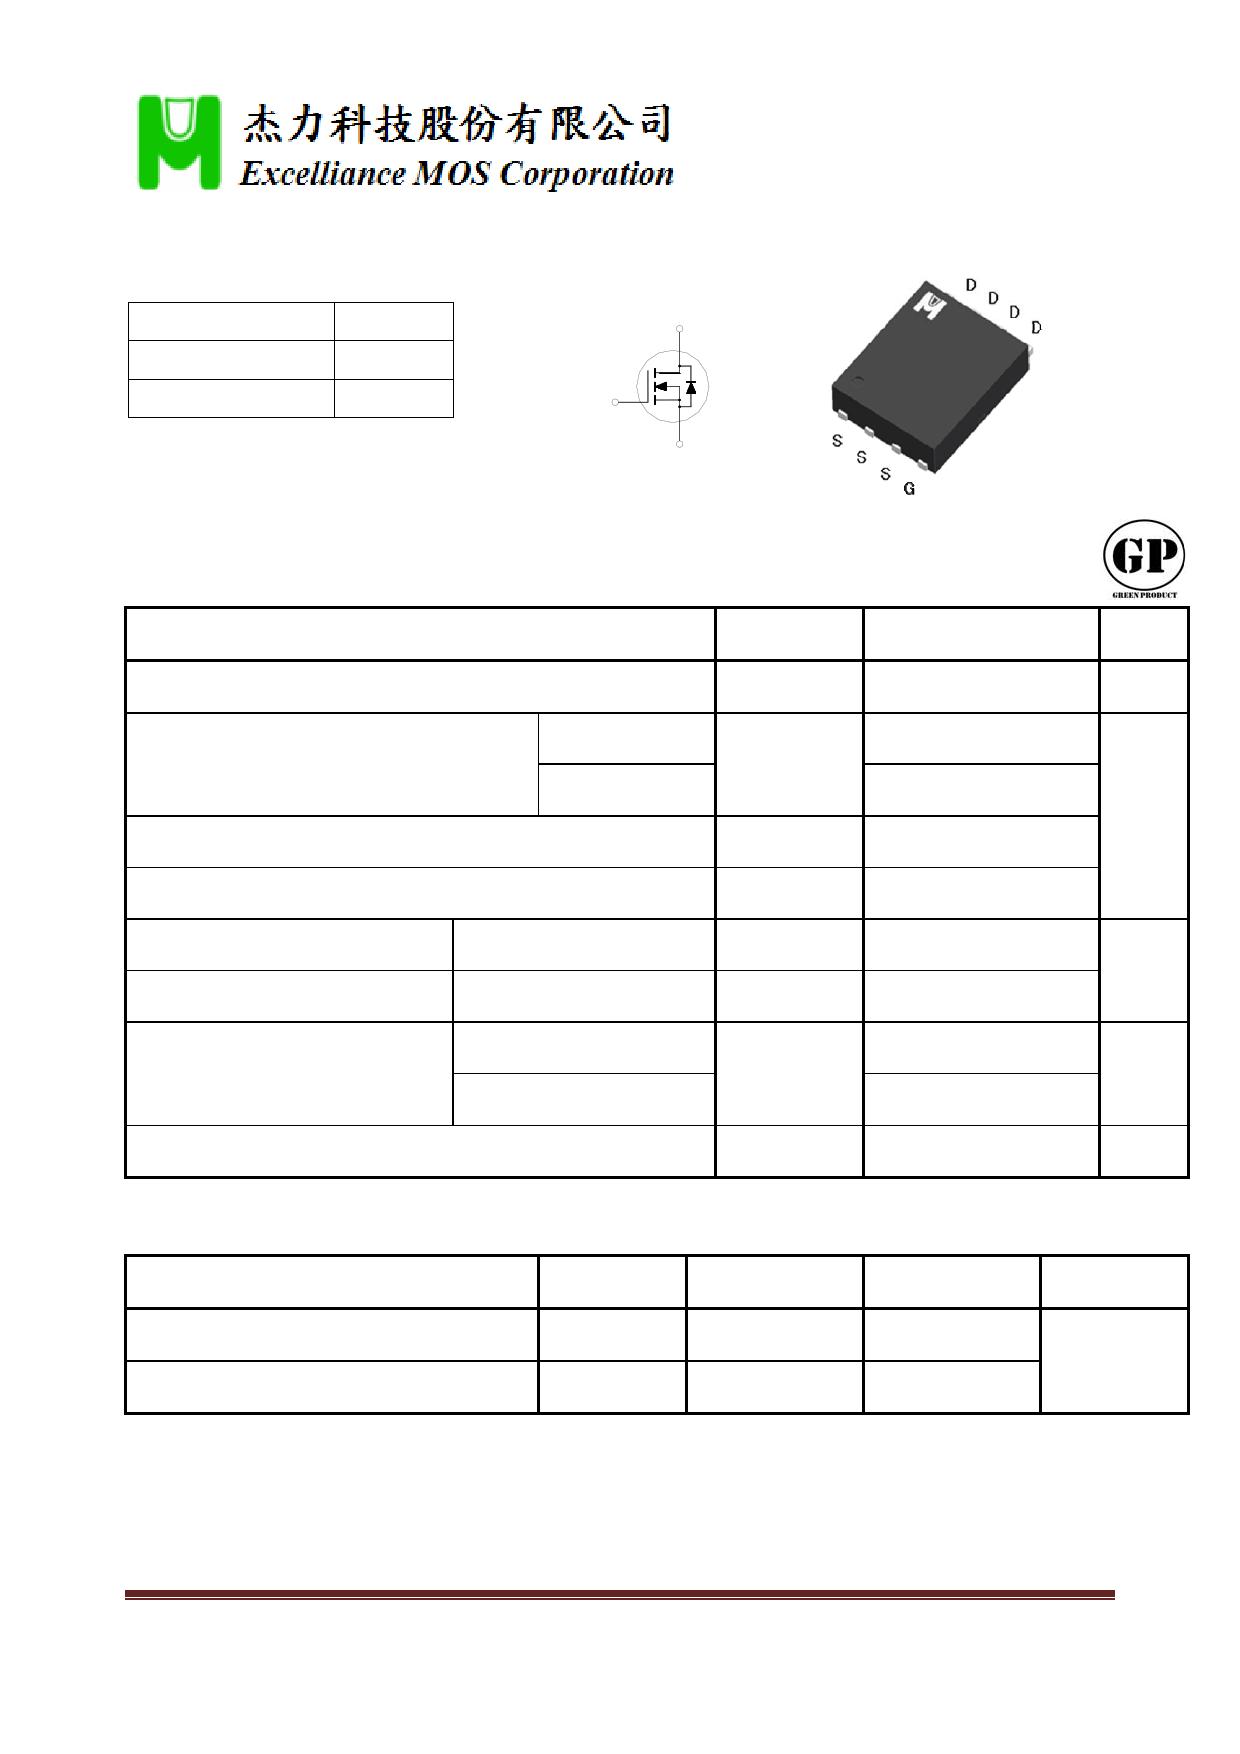 EMB14N10H دیتاشیت PDF